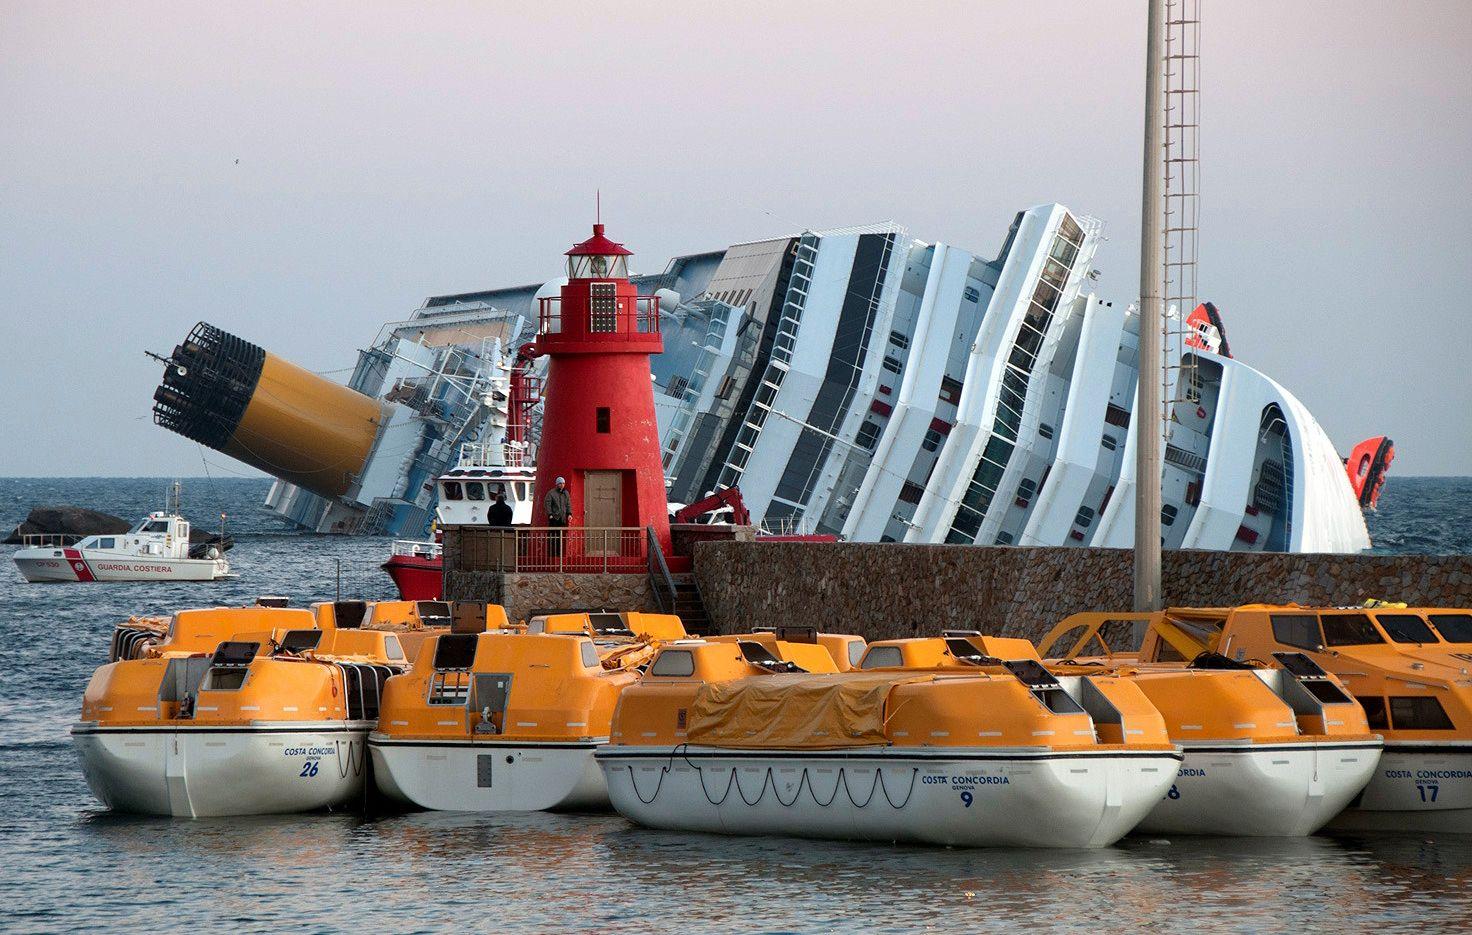 List Of Shipwrecks In Wikipedia The Free Encyclopedia - Carnival cruise ships wiki